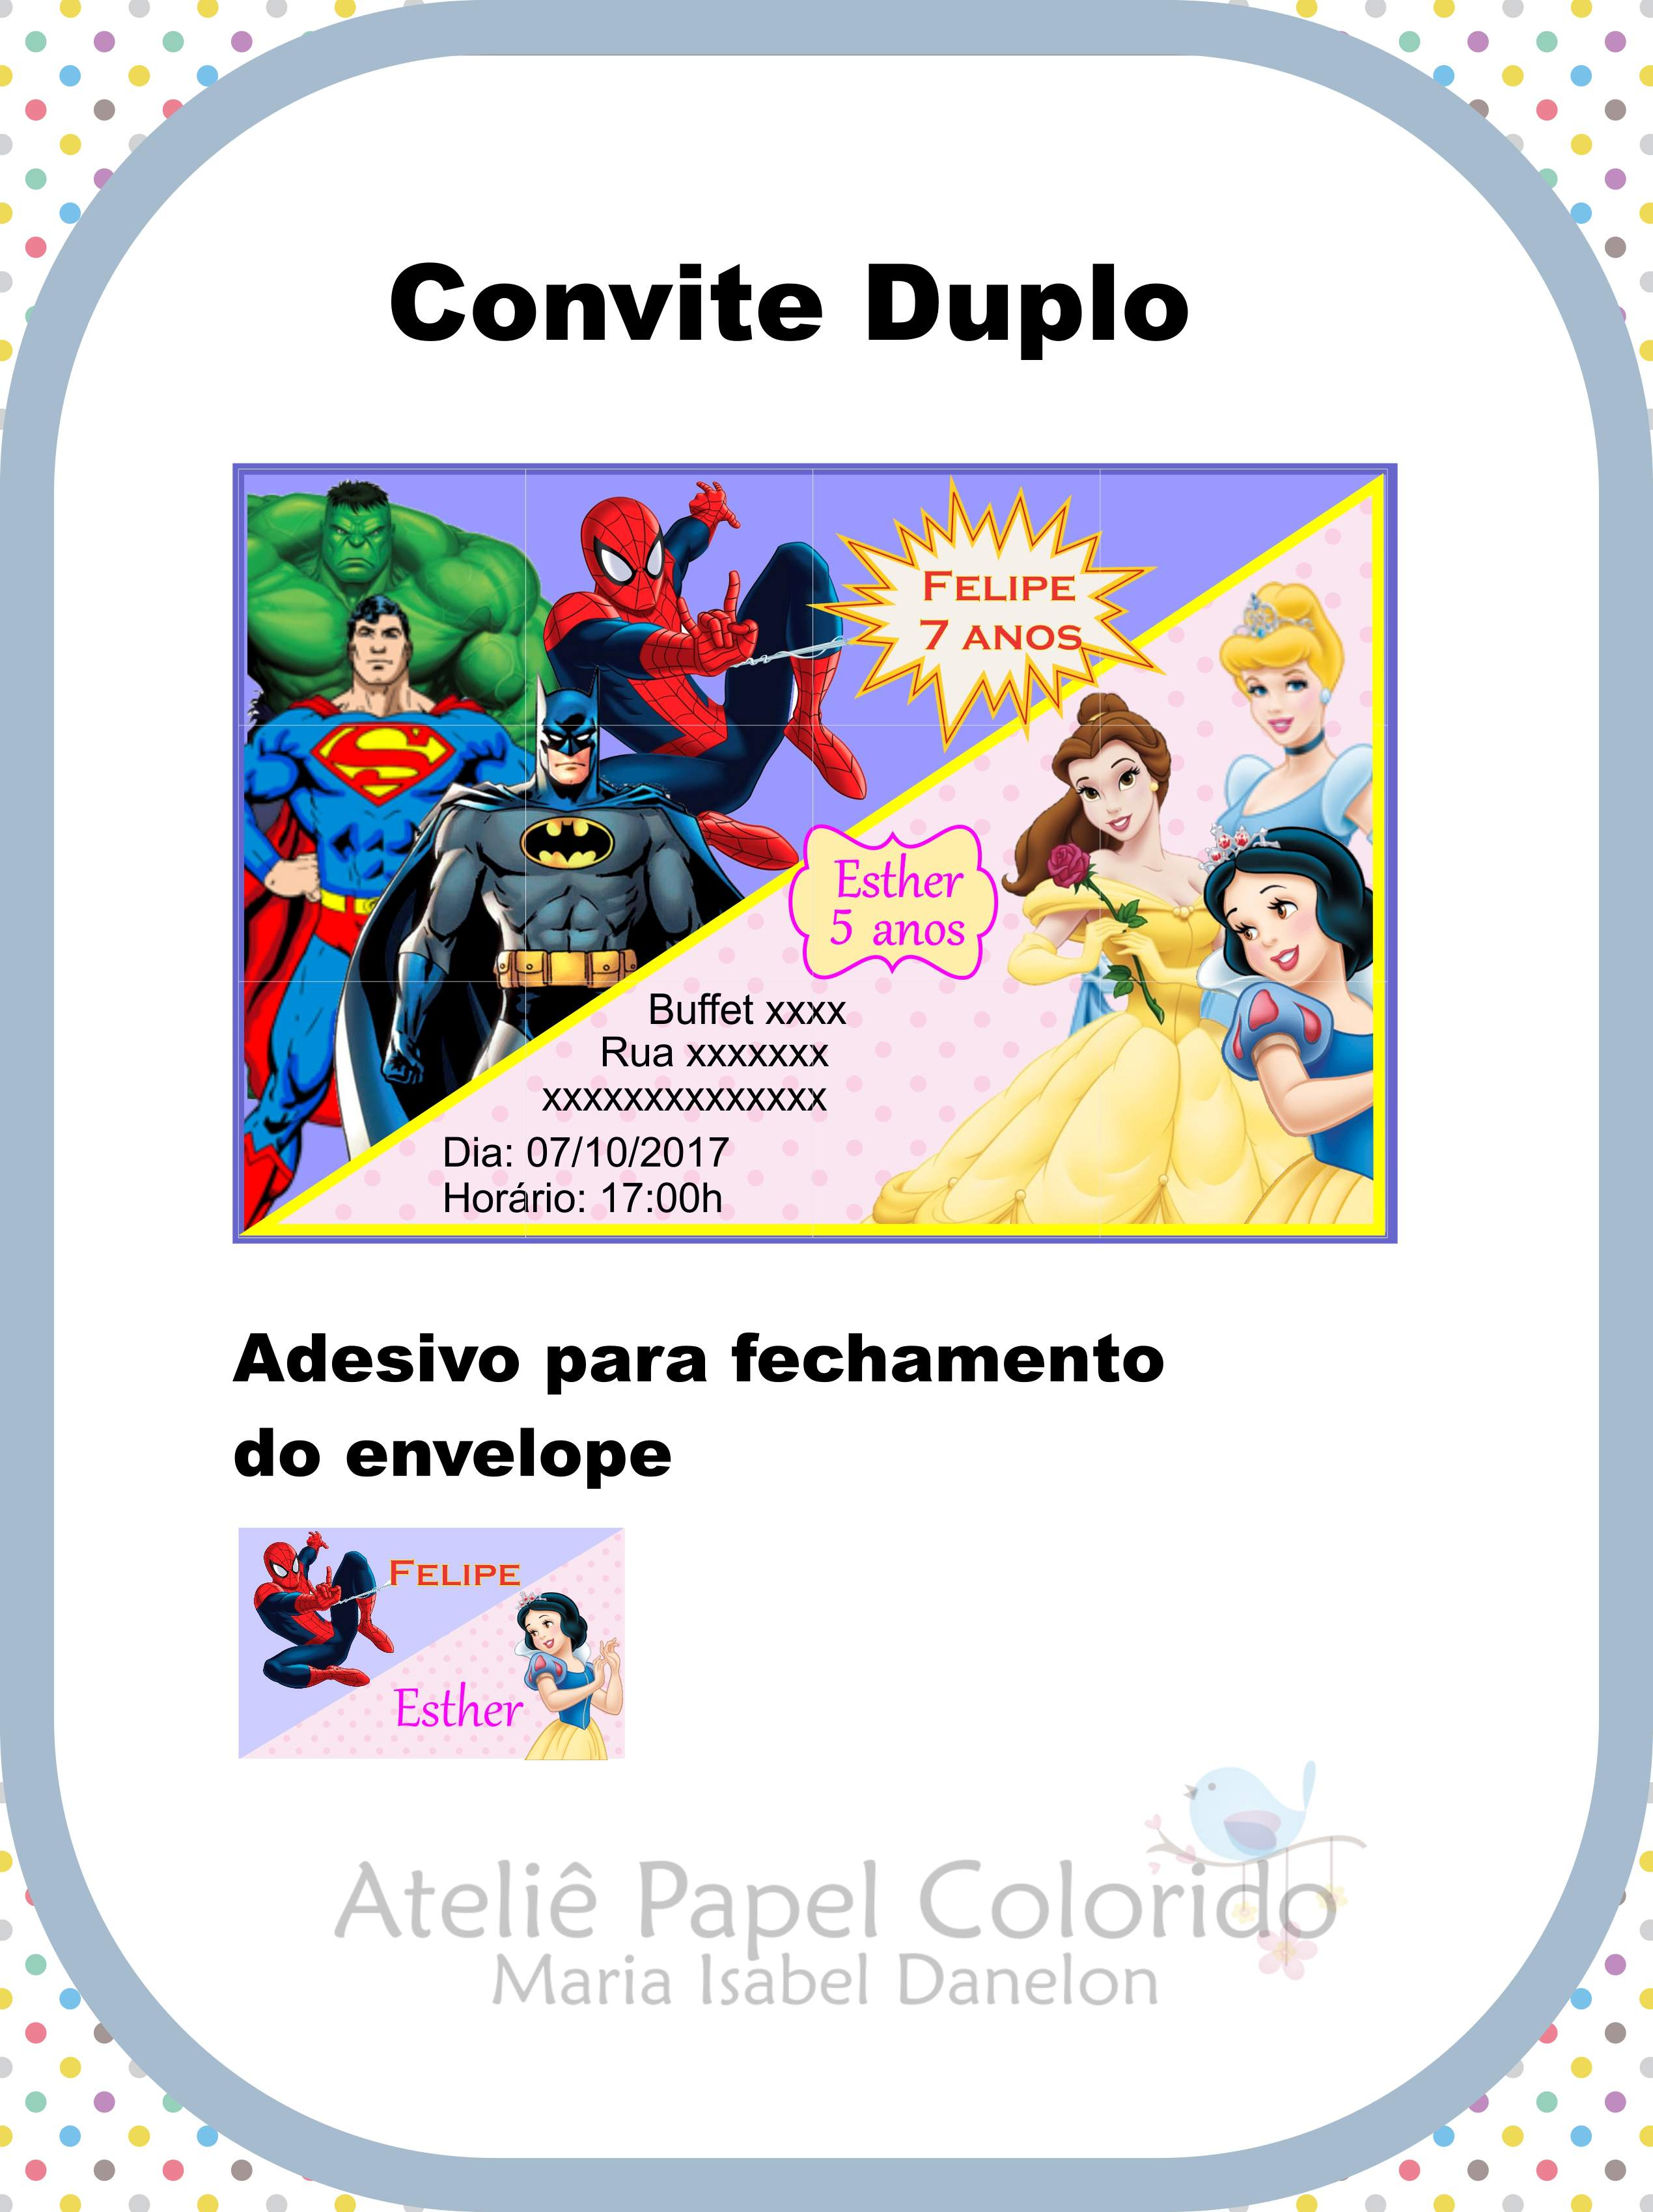 Convite Duplo Elo7